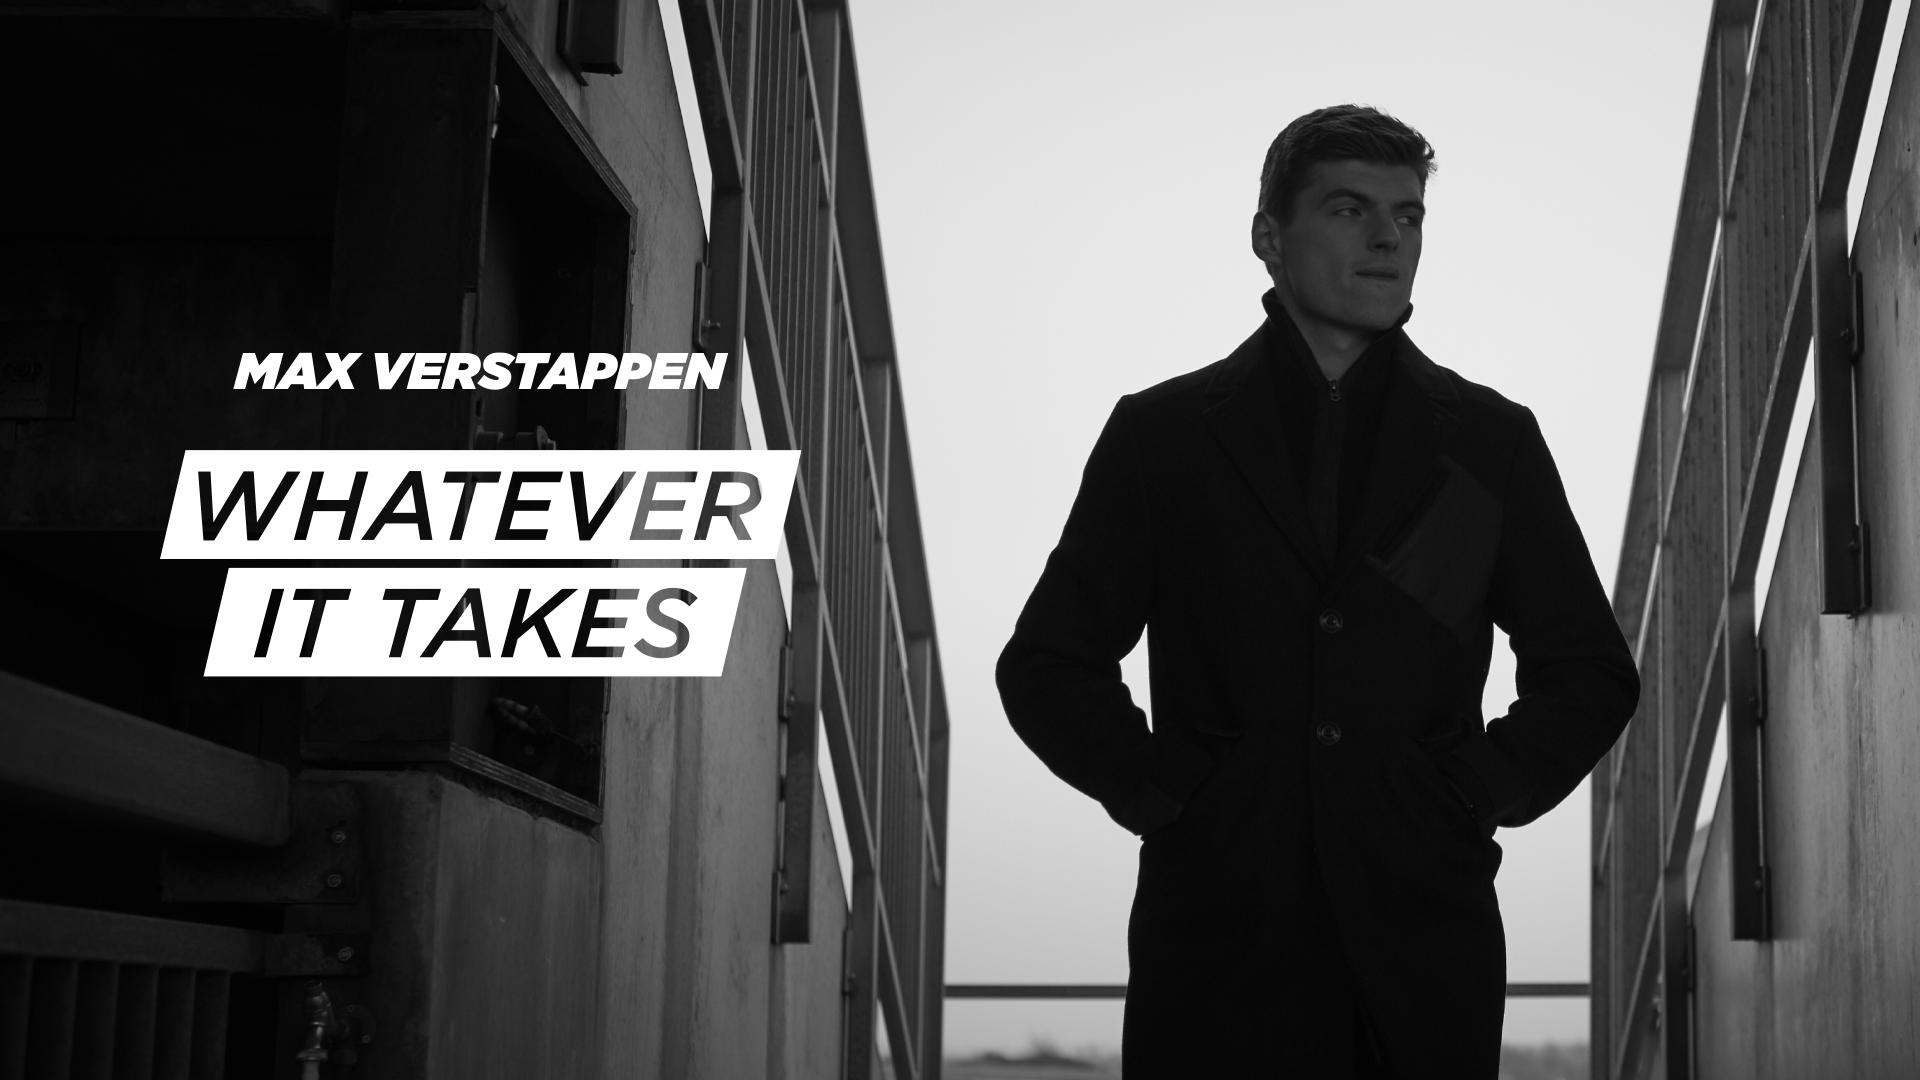 Documentaire Max Verstappen